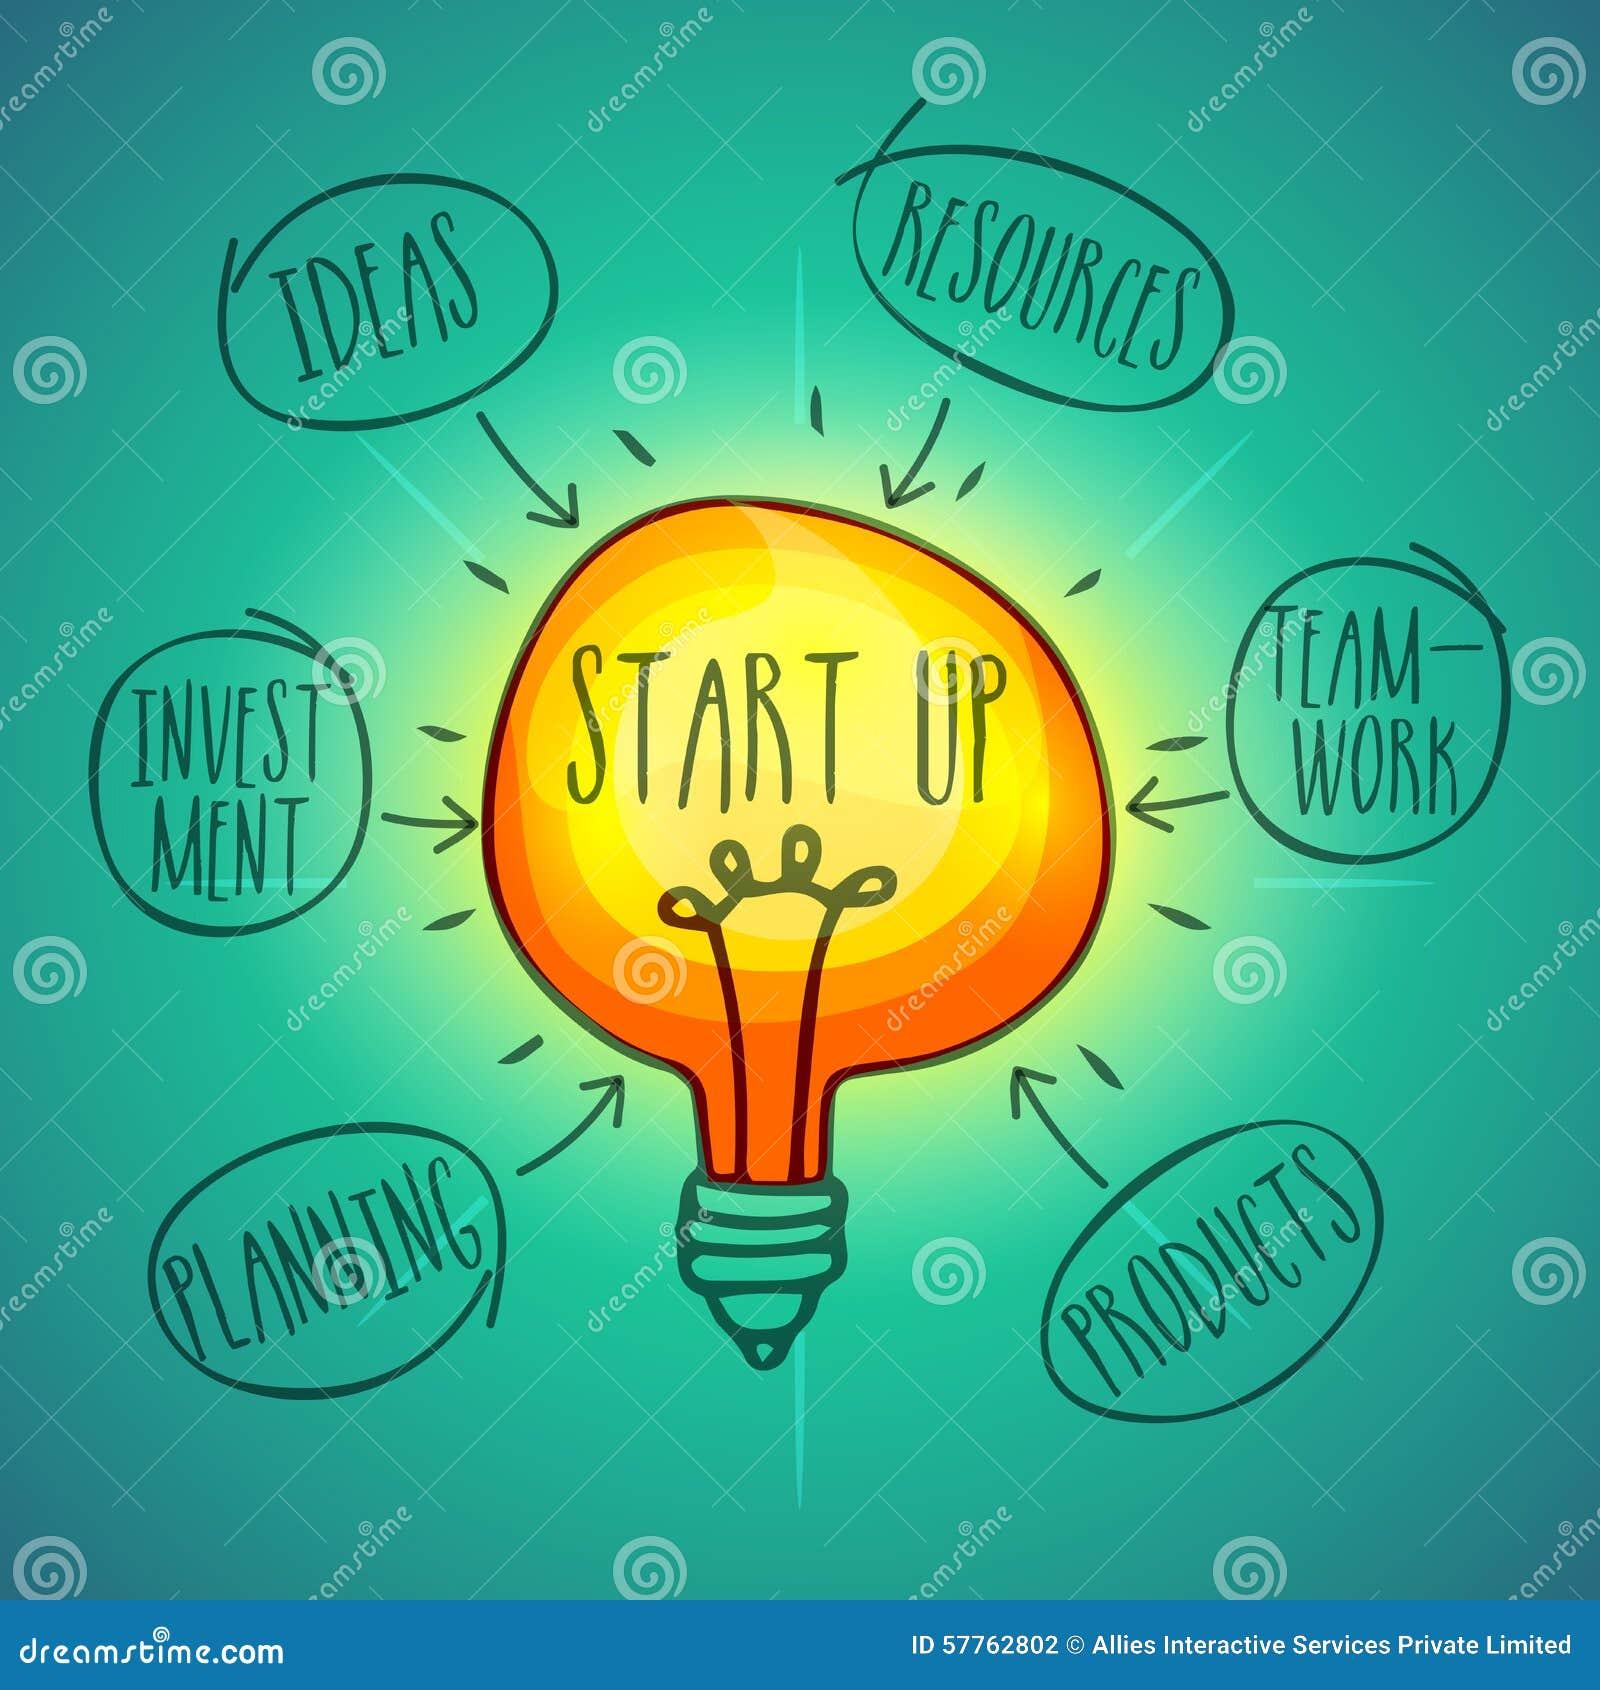 Light Process Company: Light Bulb For Business Startup. Stock Illustration